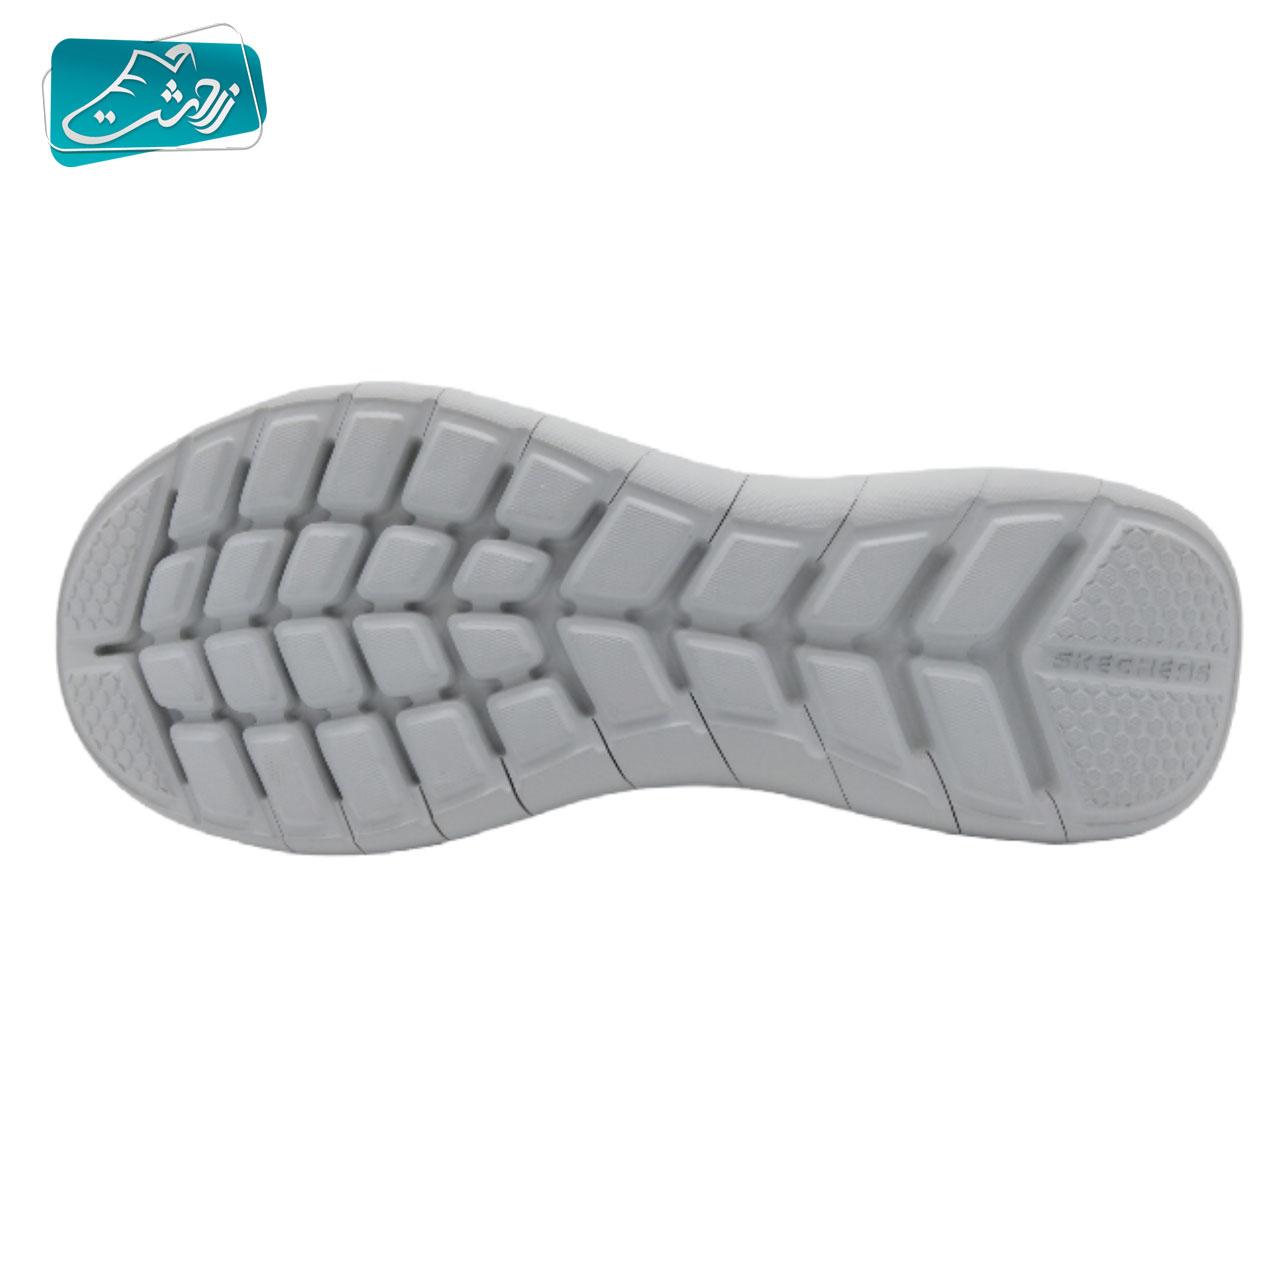 http://zarshoes.ir/uploadfile/file_portal/site_5571_web/file_portal_end/shop/انبار-قدس/product/کفش-ورزشی-11/bounder_blk/1.jpg